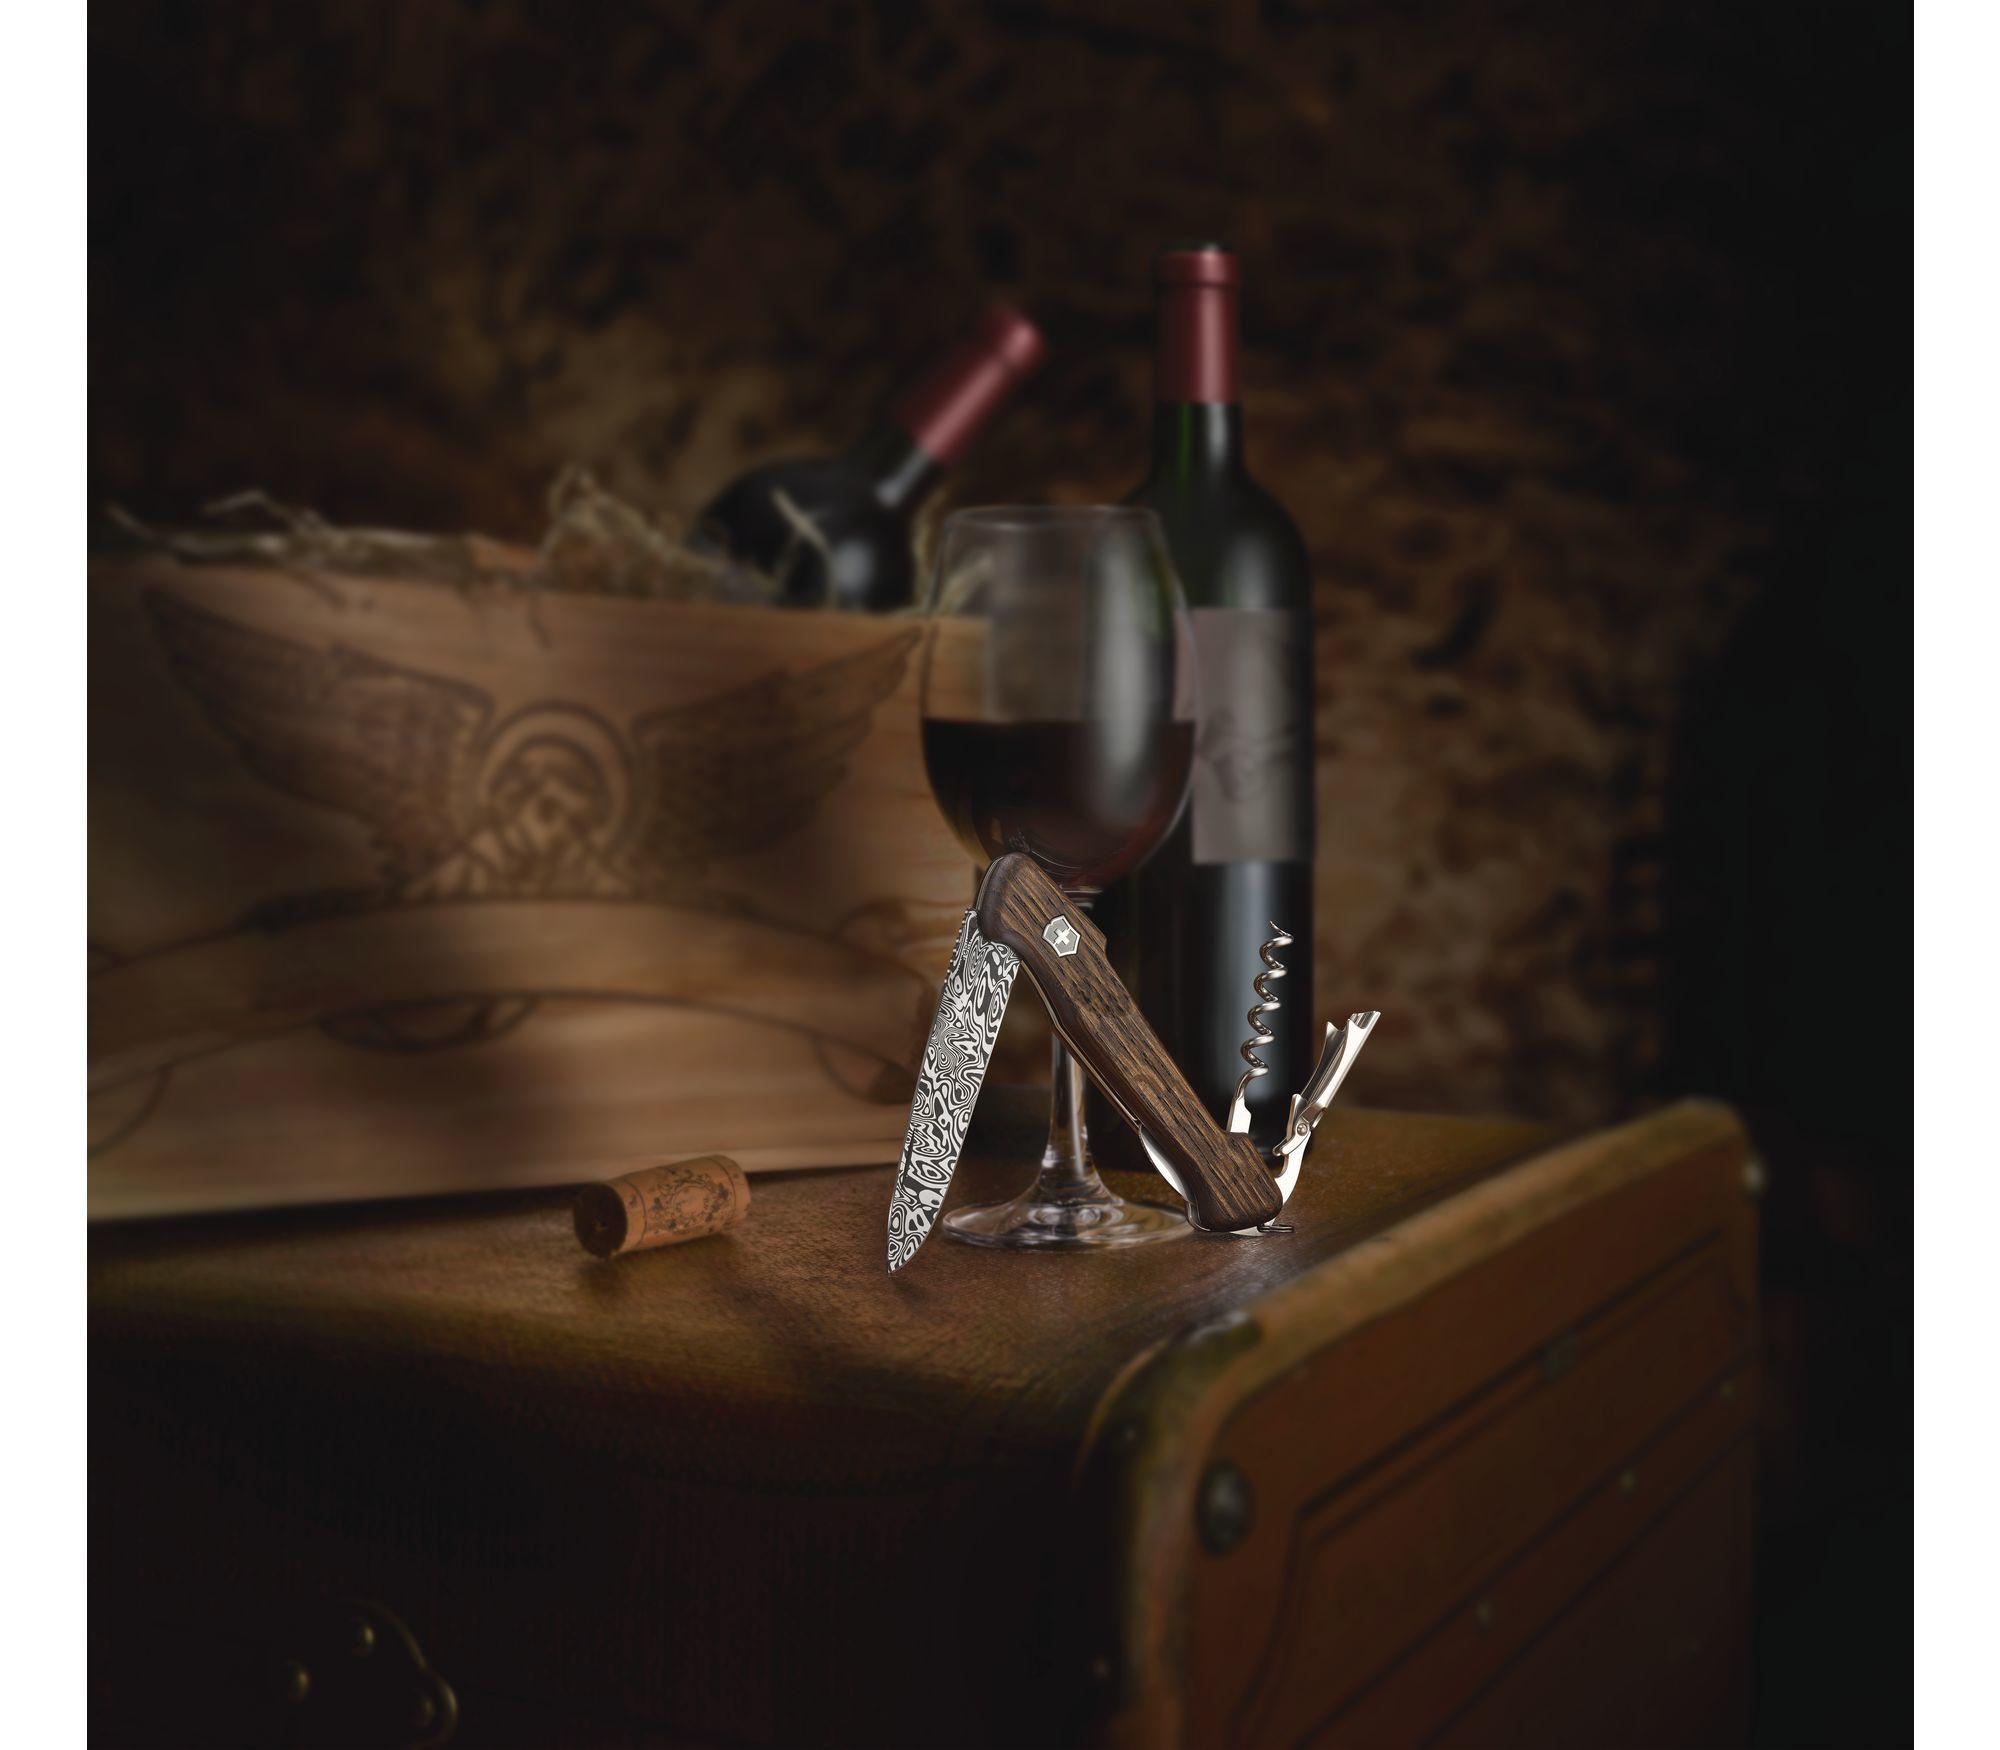 Victorinox Wine Master Damast Limited Edition 2019 (0.9701.J19)